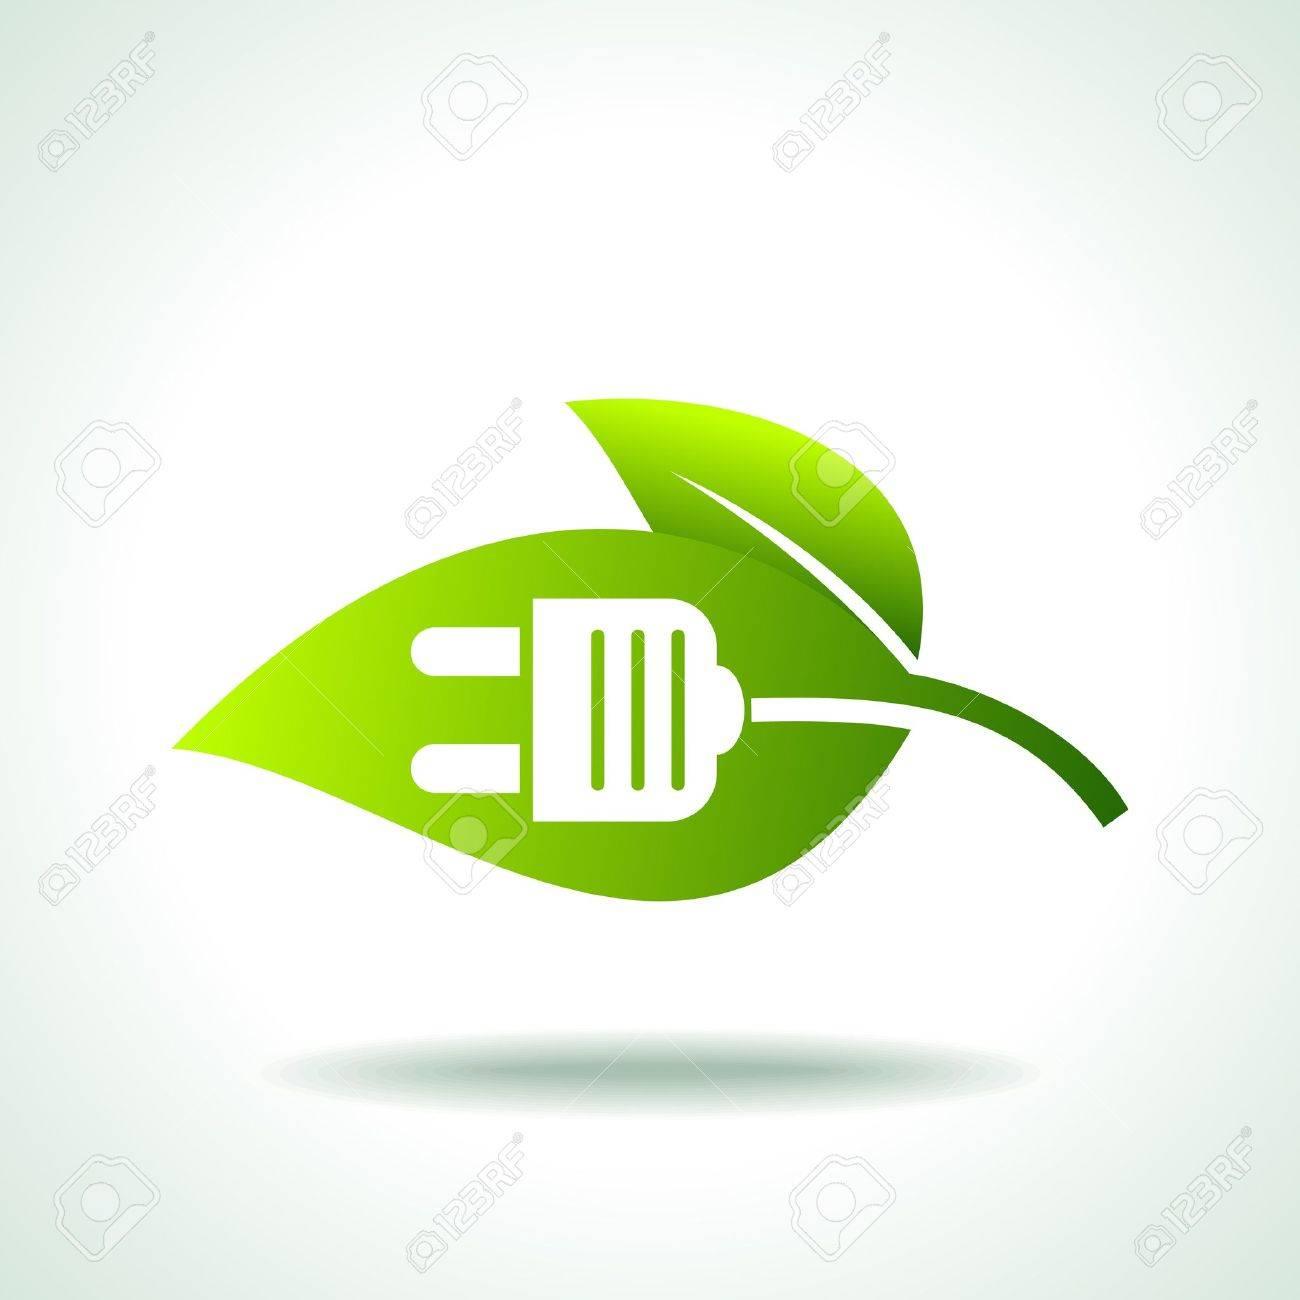 power of green energy - 17637784